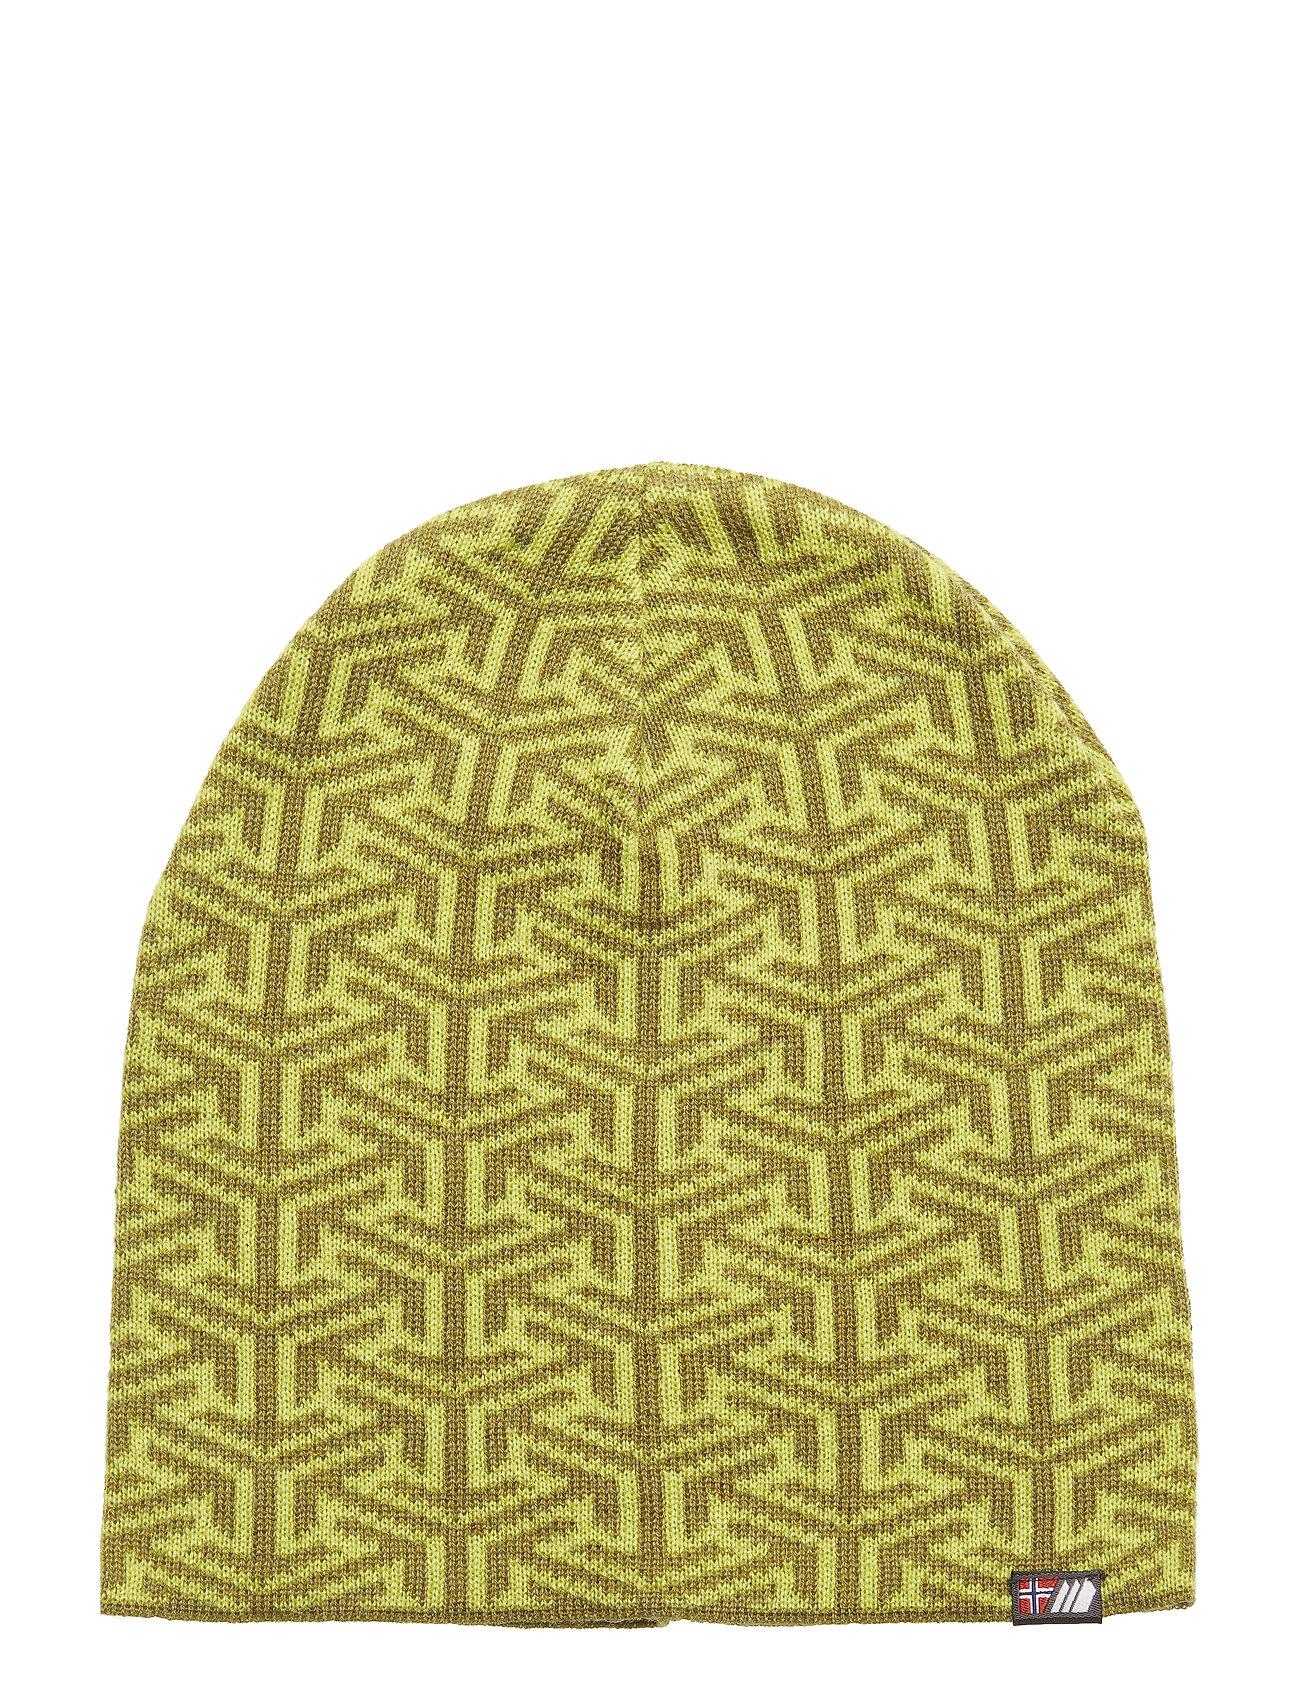 Skogstad Maradalen knitted hat - ACID LIME PR